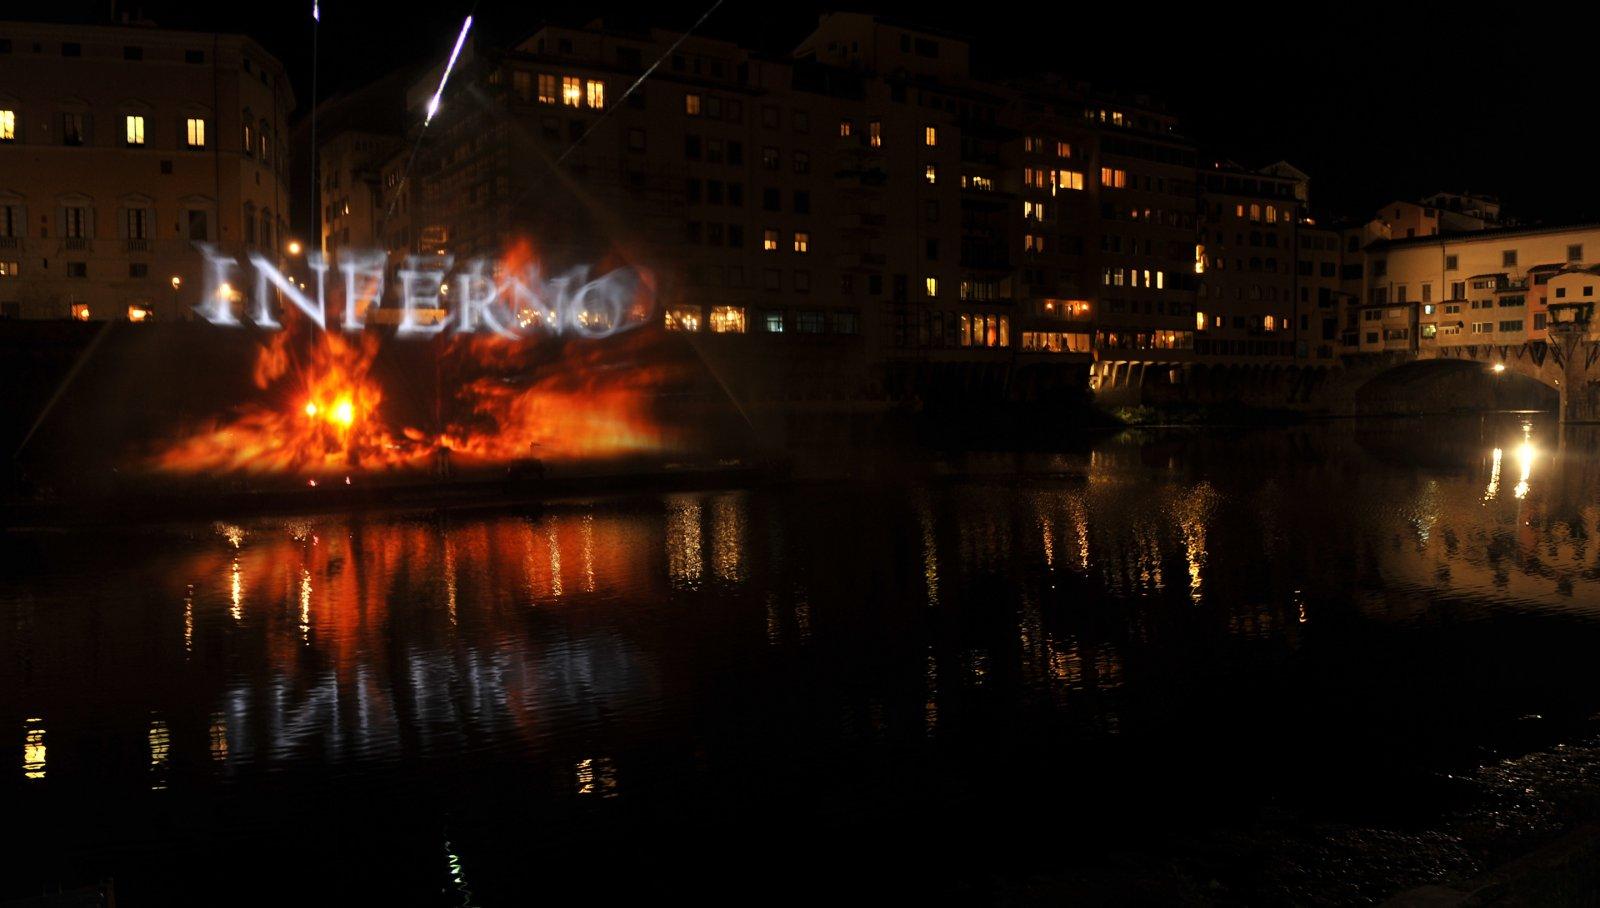 Inferno Firenze IGPDecauxLive